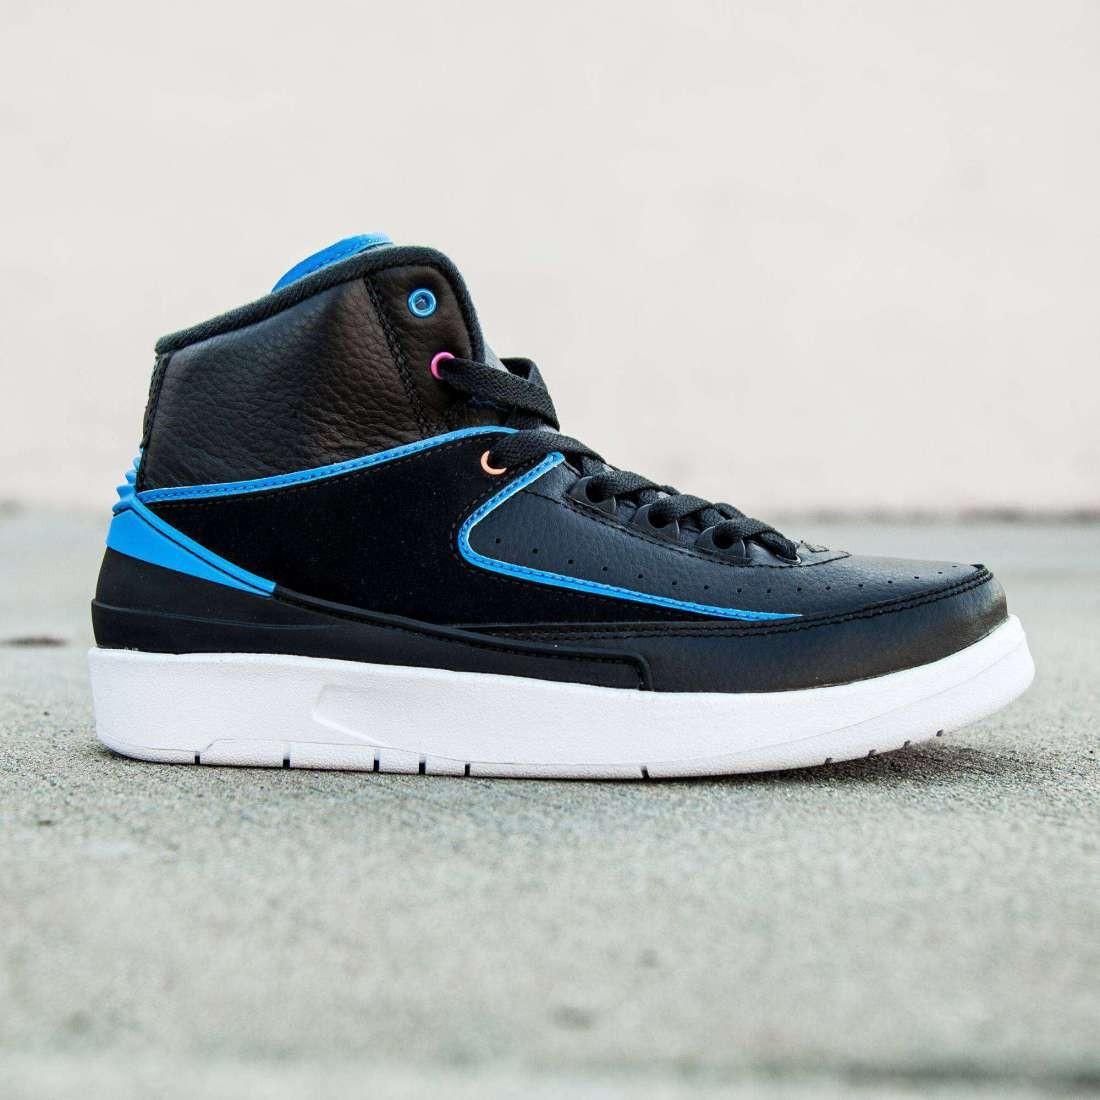 best loved b8cd5 53775 Air Jordan 2 Retro Big Kids (black / photo blue / pink)